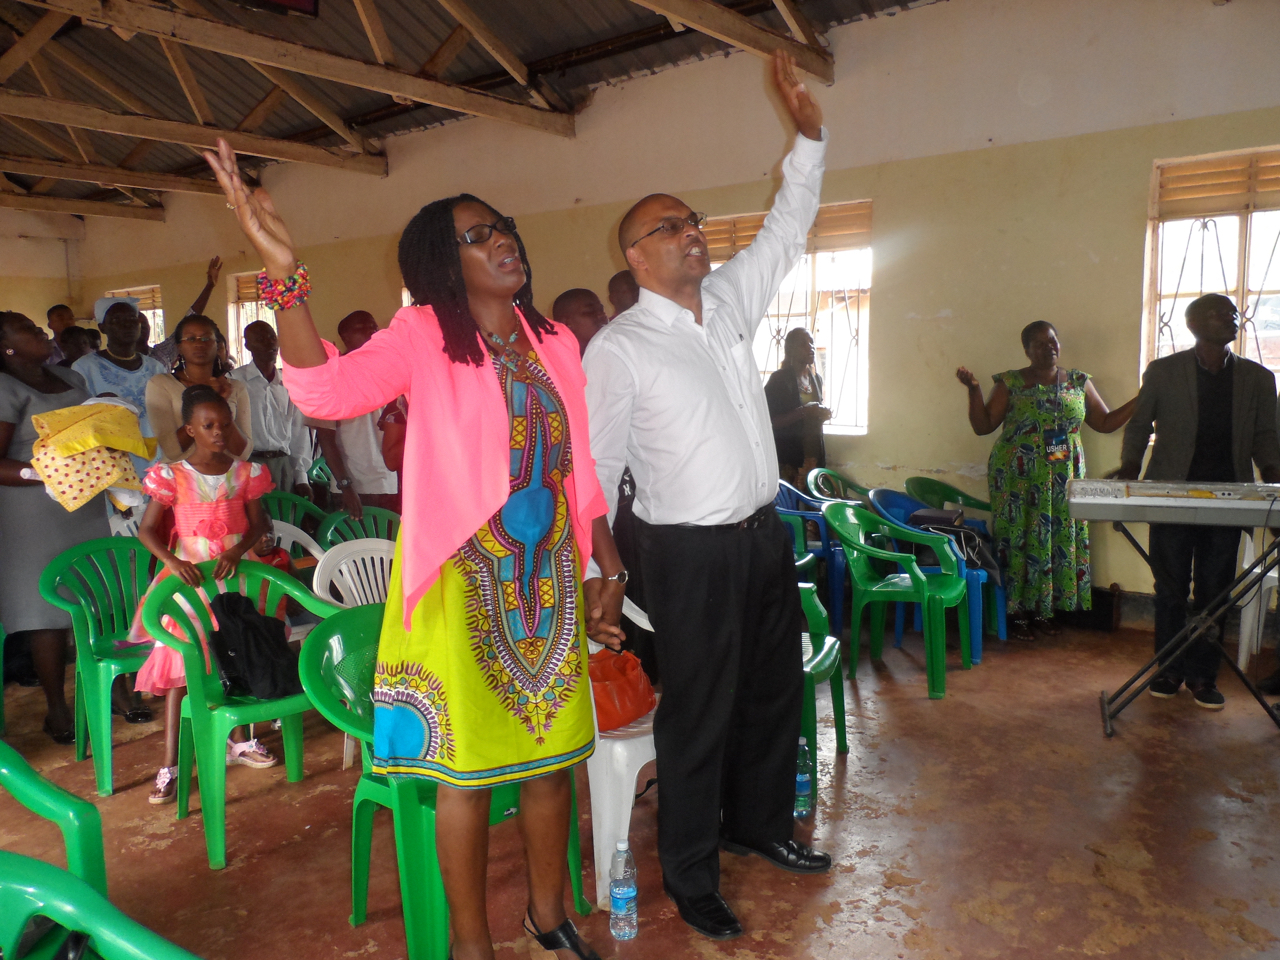 The Makintos praising God at Bombo Pentecostal Church